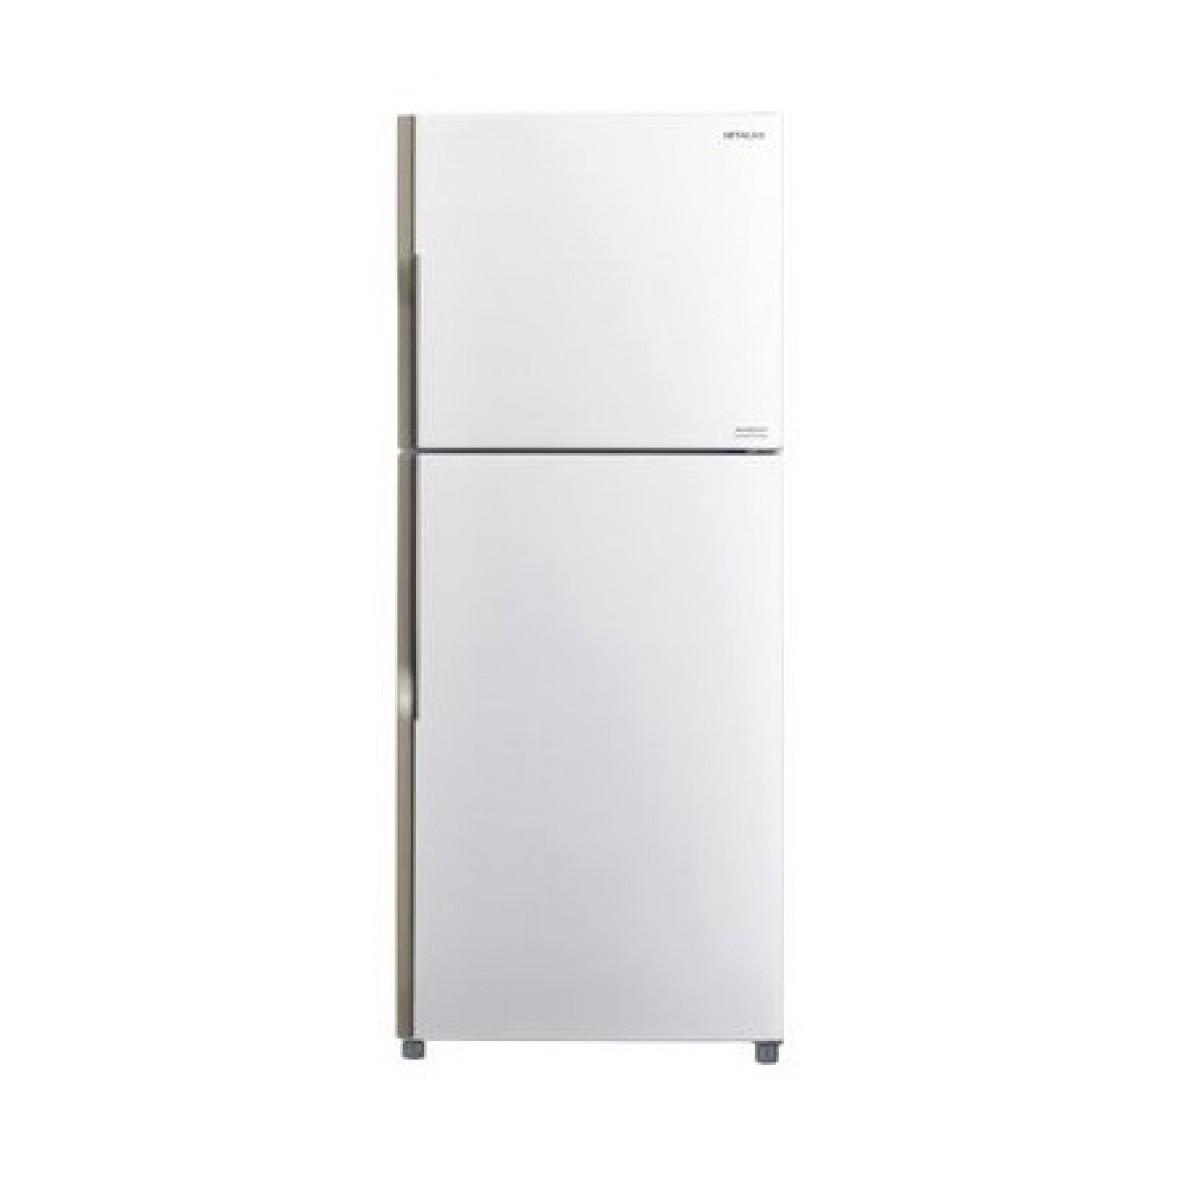 Hitachi Ψυγειο Δίπορτο  No Frost R-V400PRU3 PWH  Ψυγεία δίπορτα Ηλεκτρικες Συσκευες - homeelectrics.gr